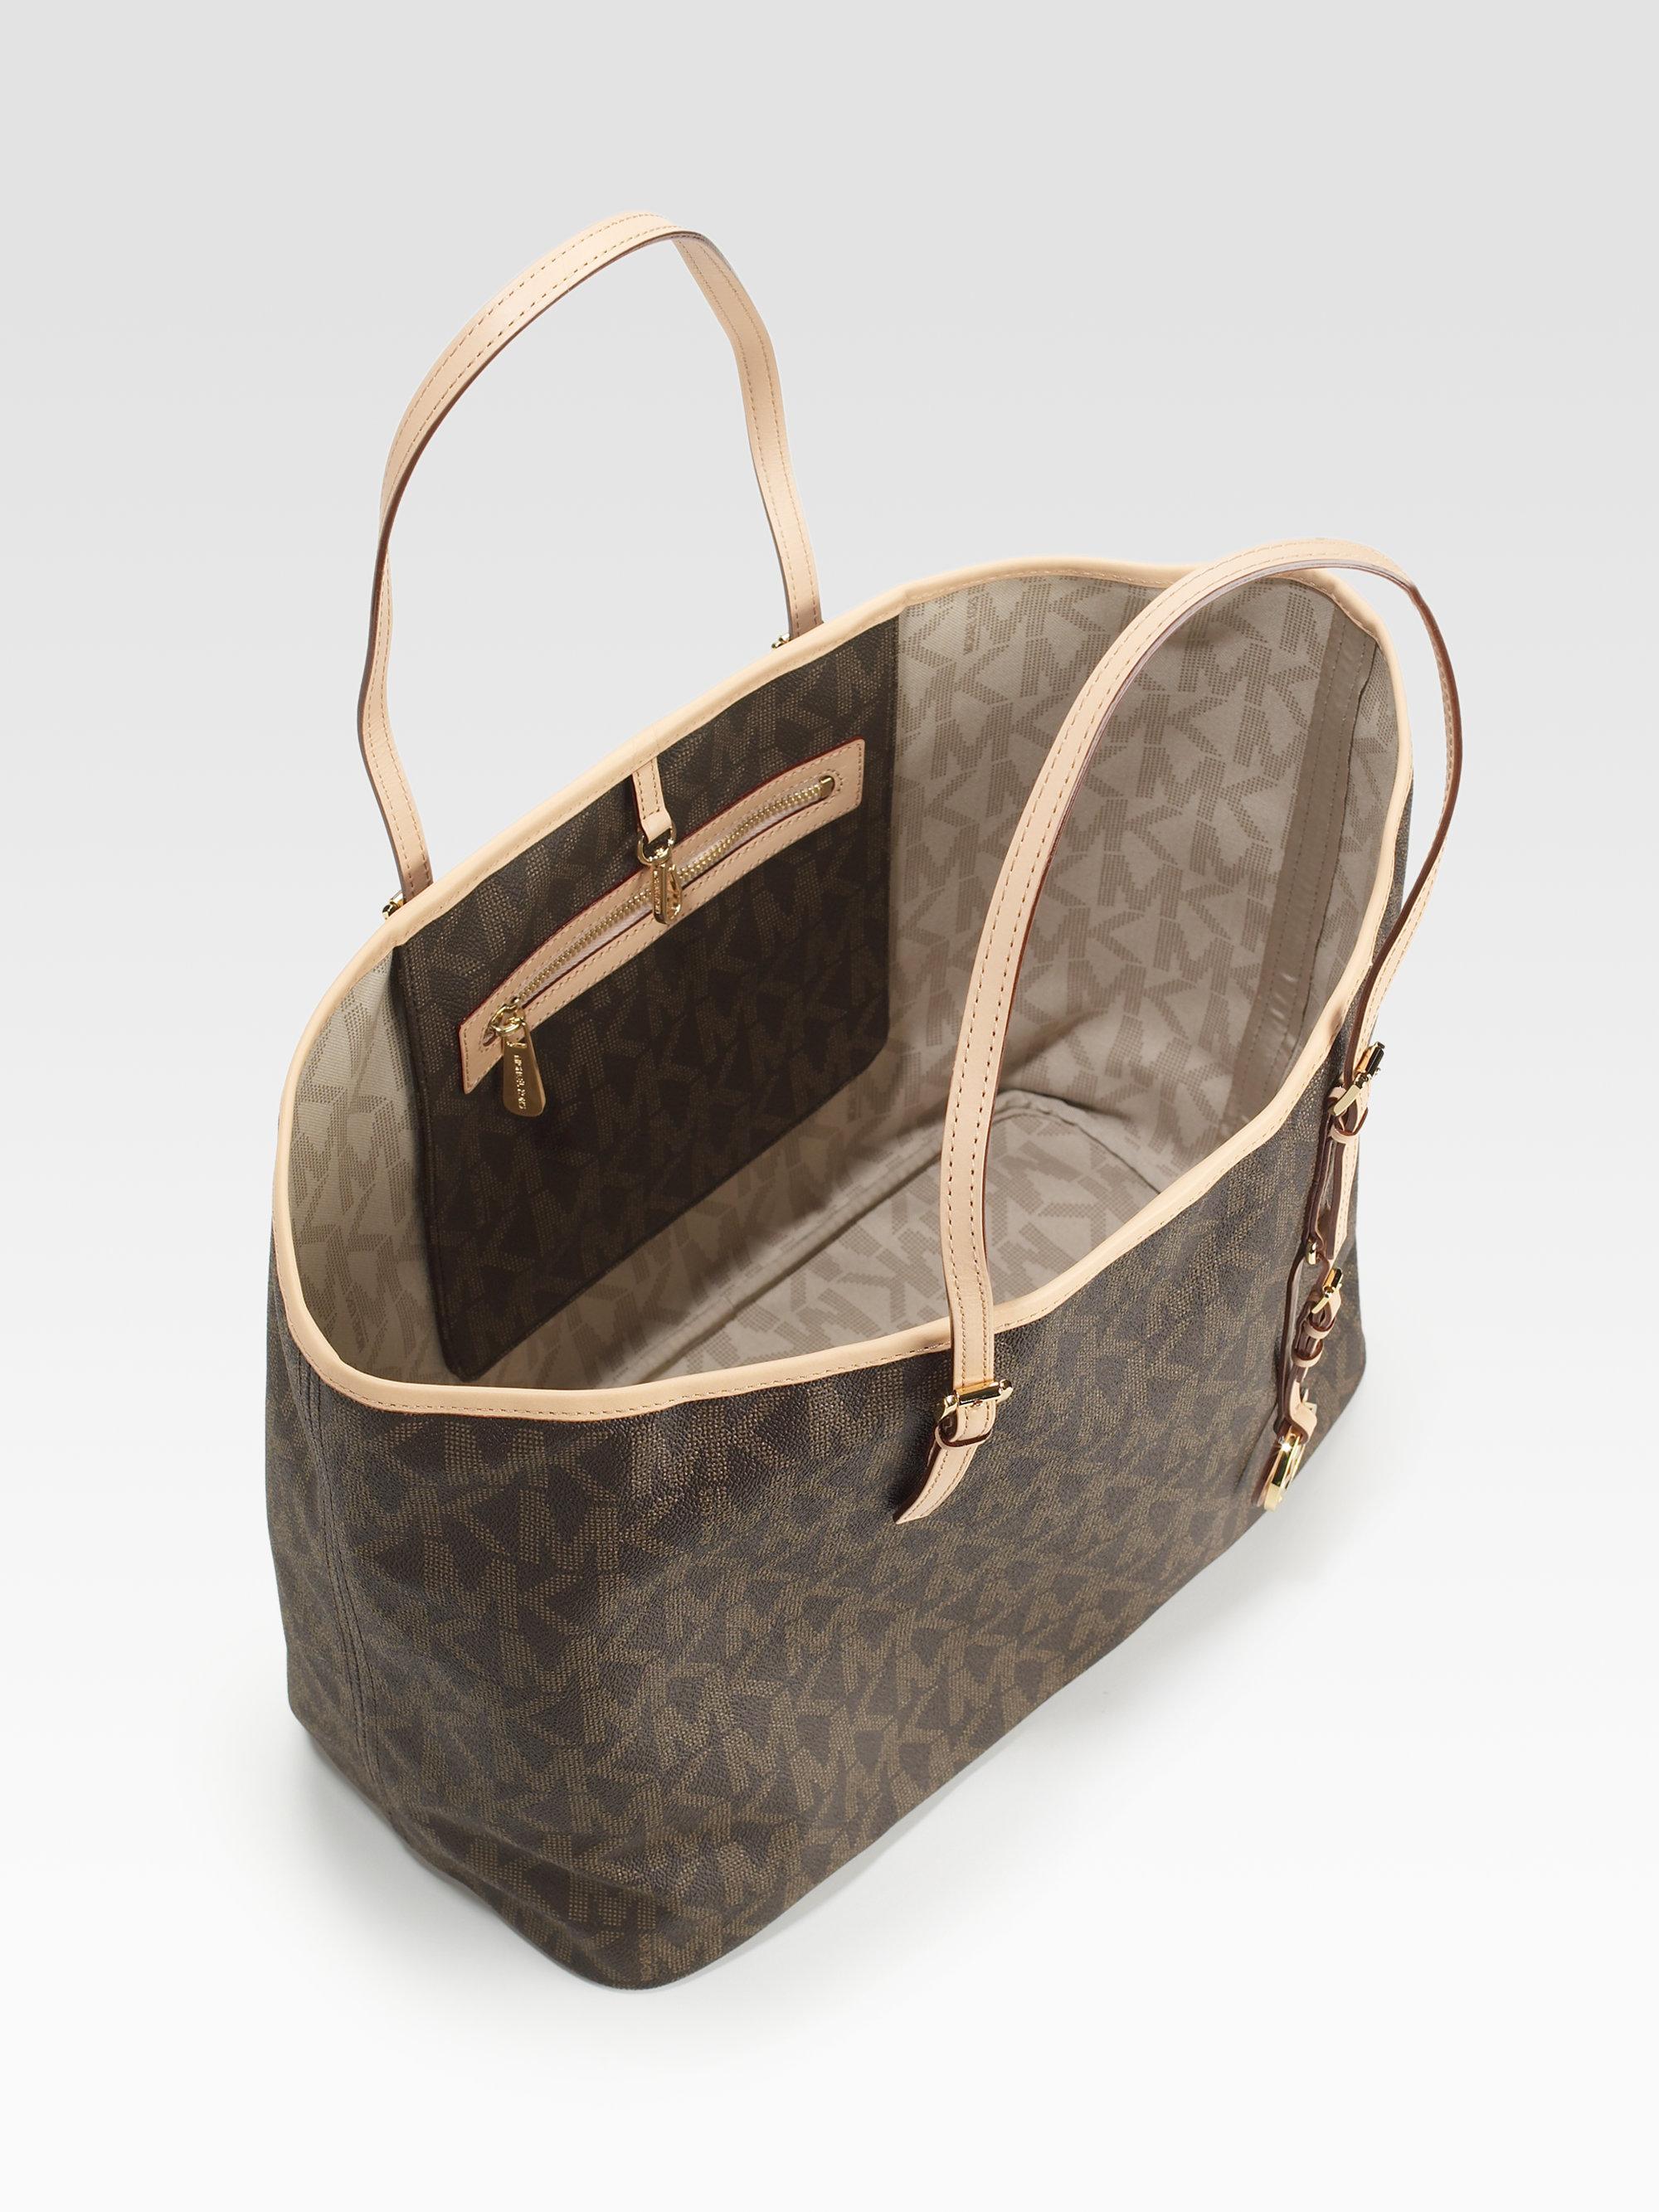 83ee1047643 Lyst - MICHAEL Michael Kors Jet Set Medium Canvas Leather Travel Bag ...